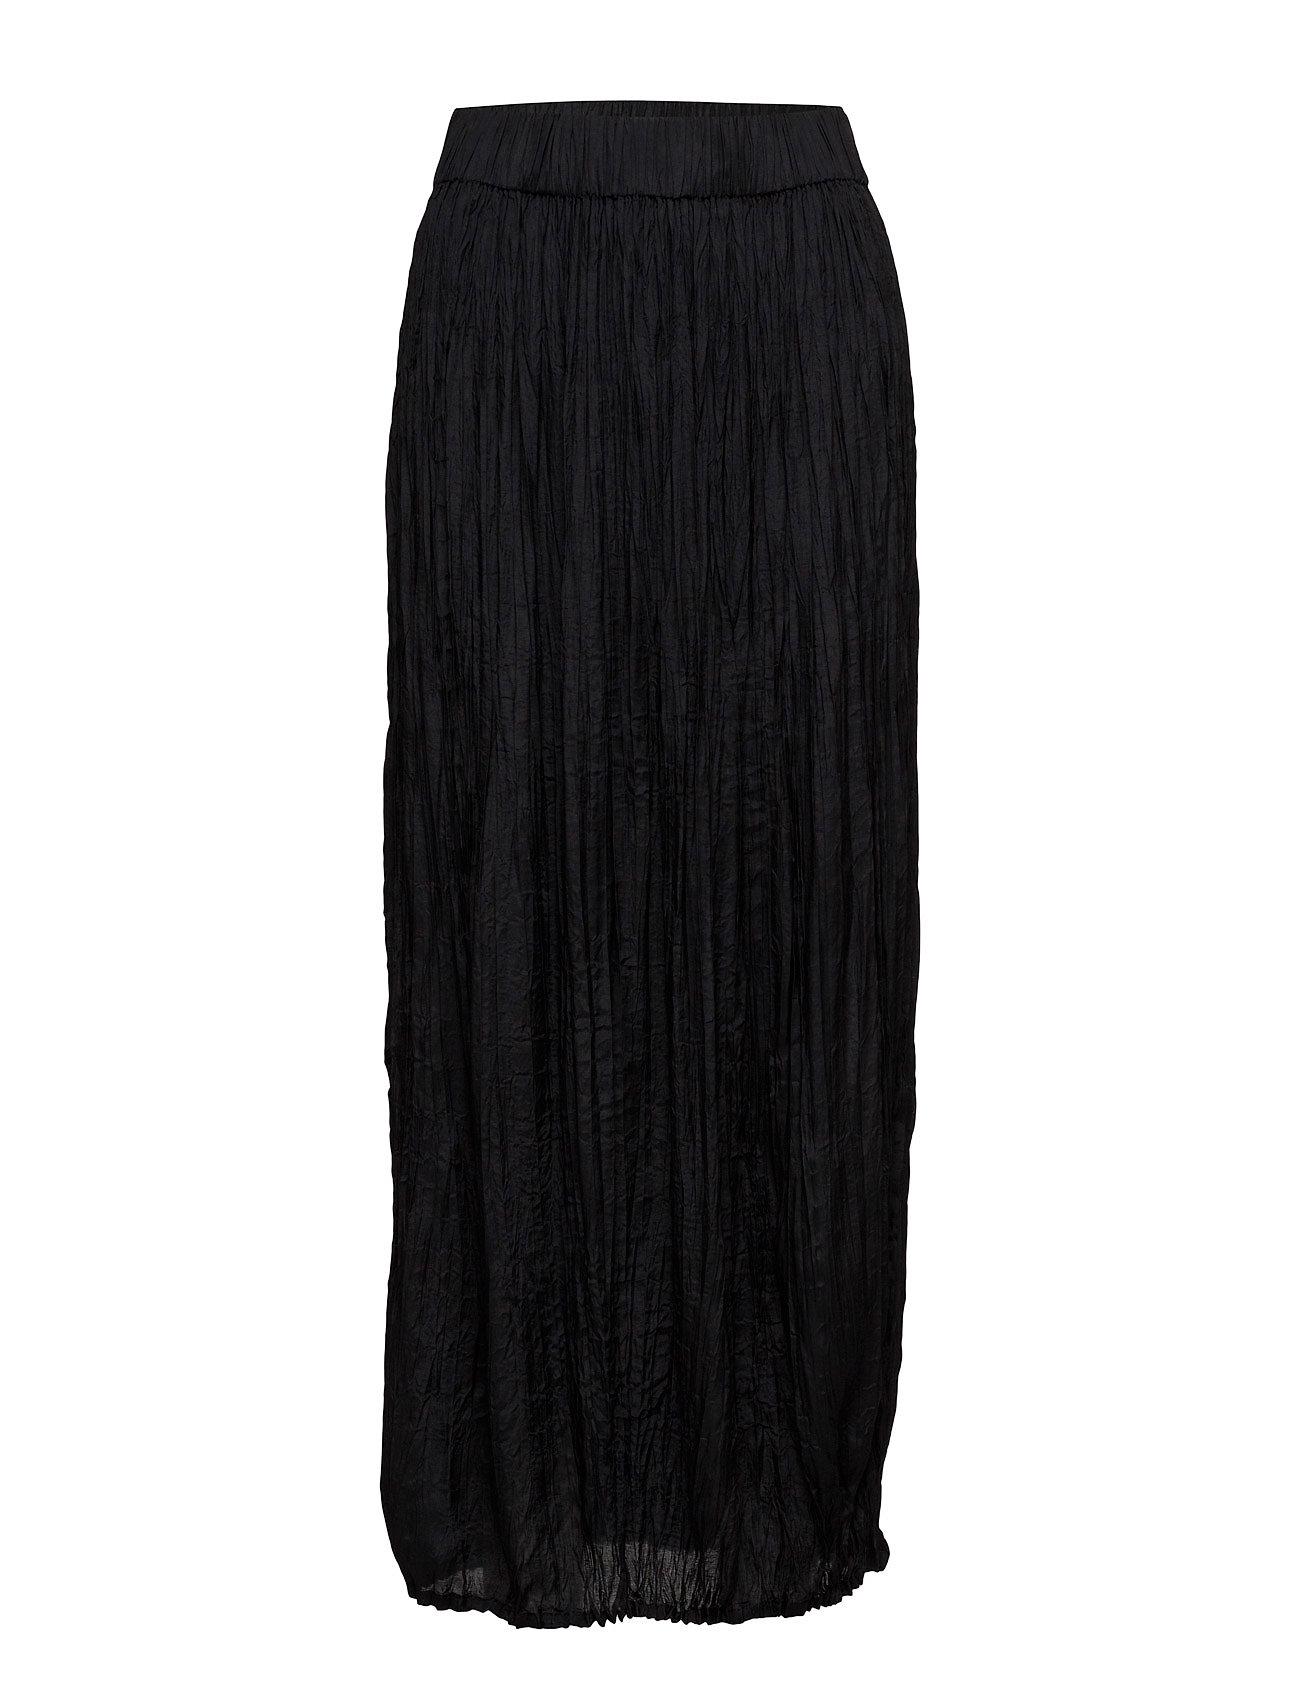 Sondra Skirt Ew Maxi Masai Maxi til Damer i Sort